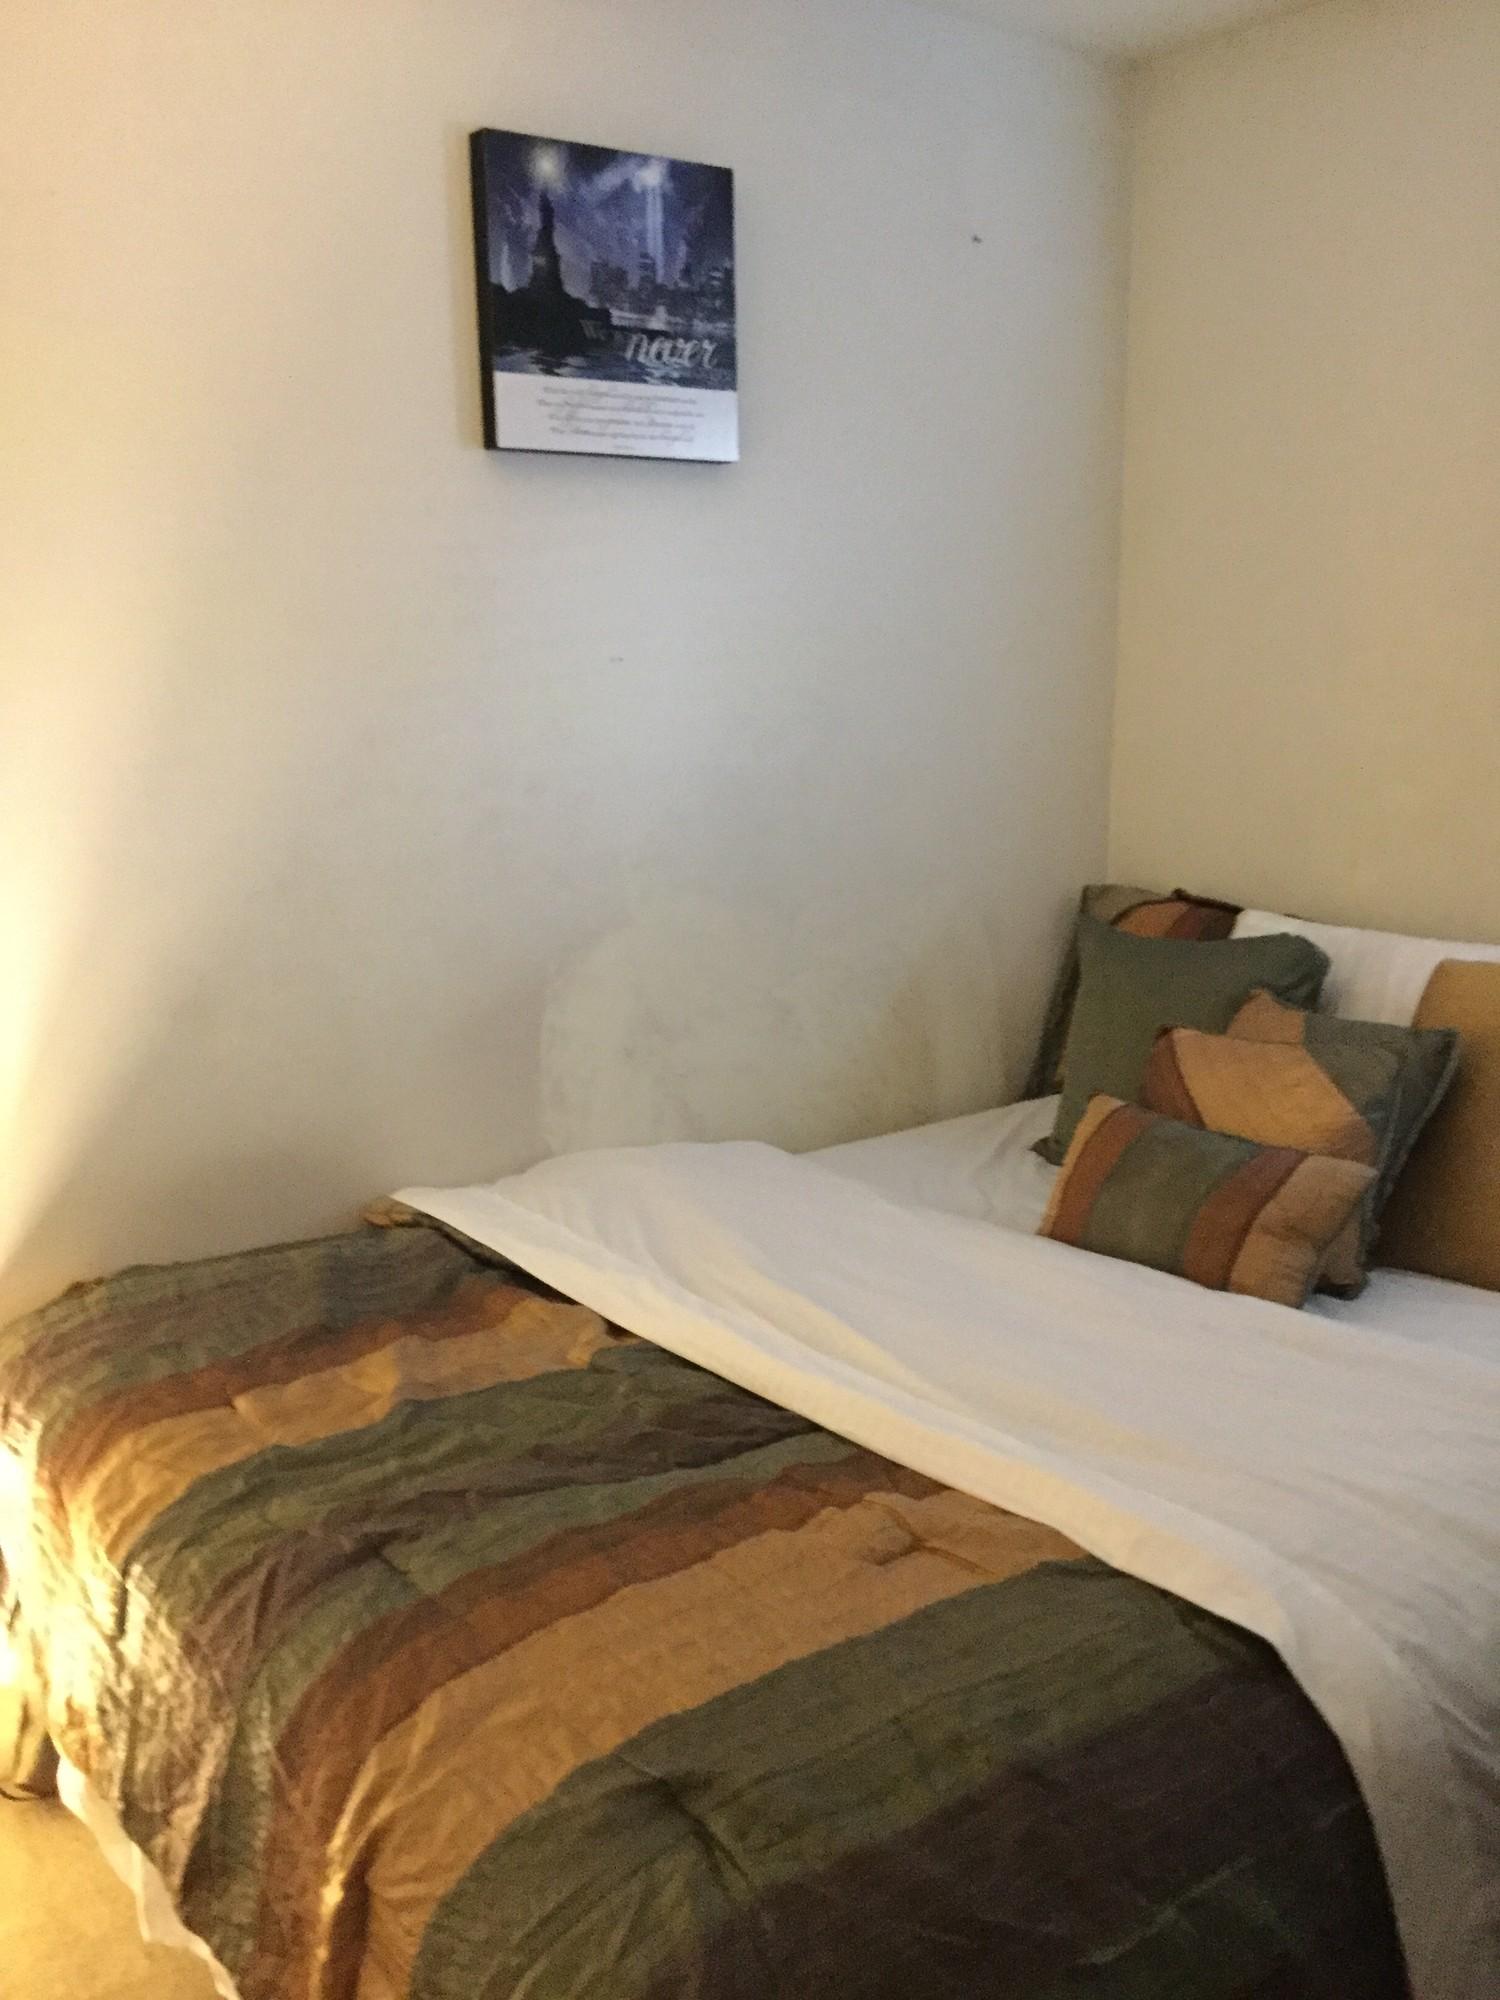 Room for Rent in Woodbridge/Dale City VA